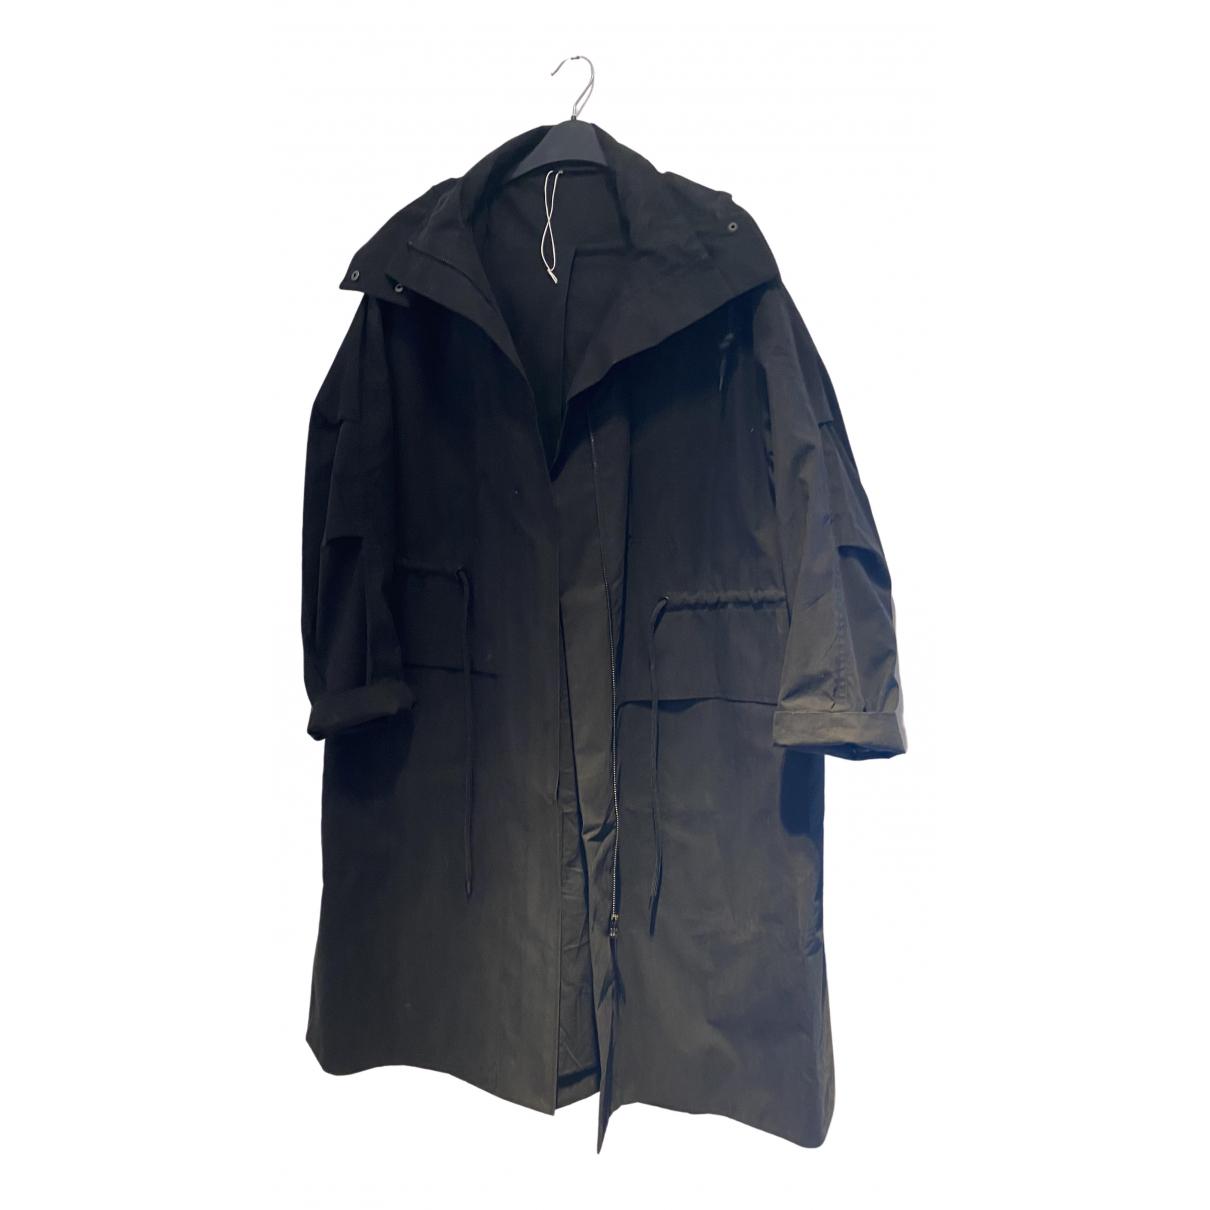 Cos N Black Cotton jacket for Women 6 UK